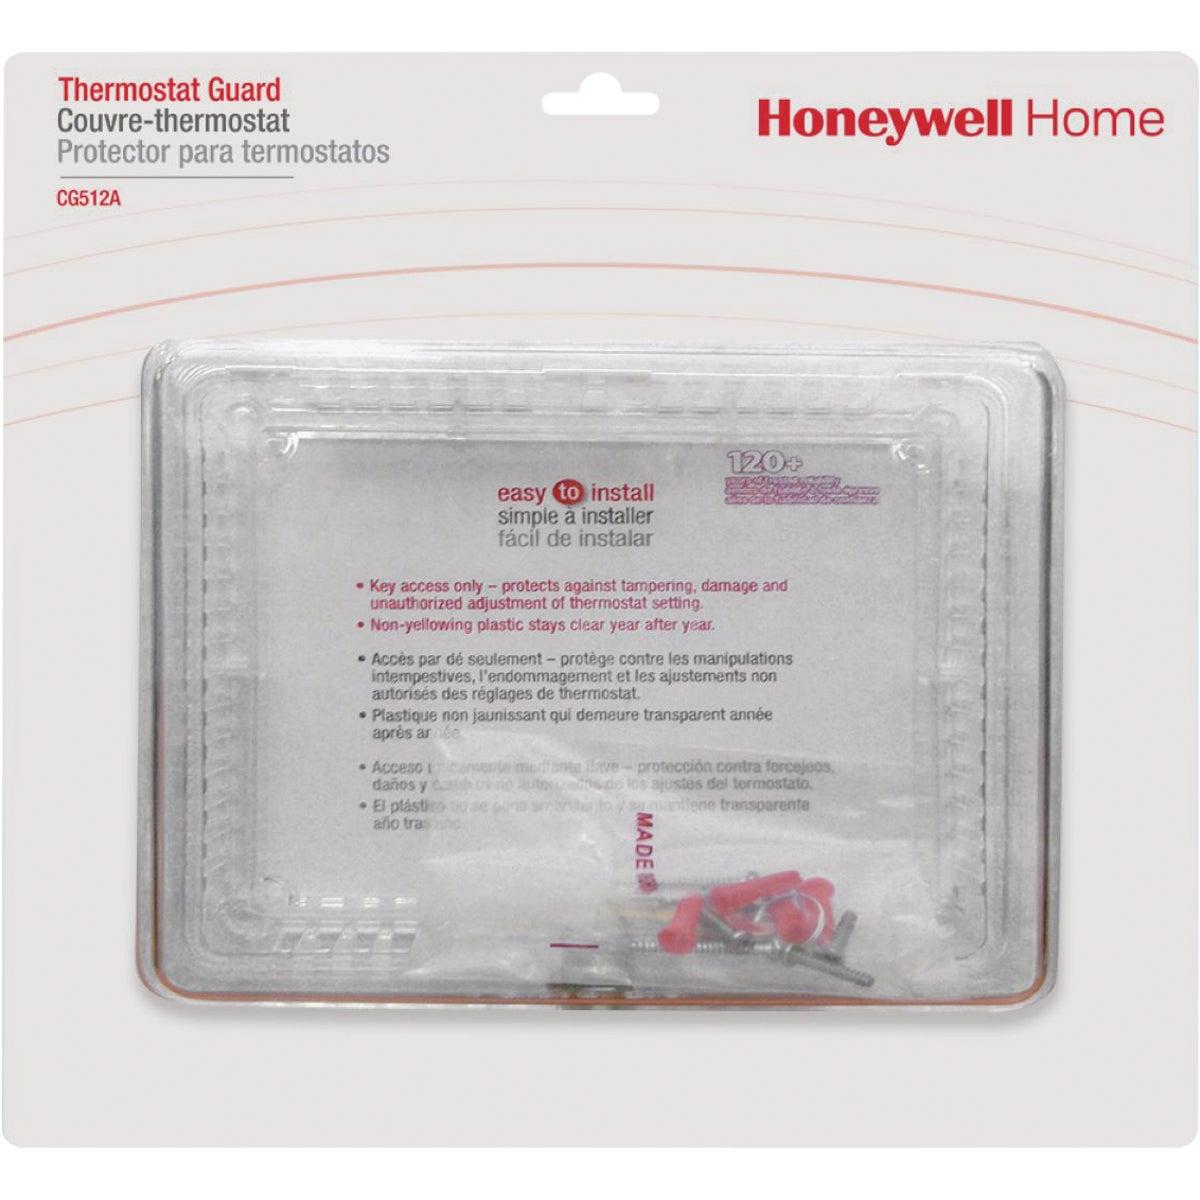 Honeywell International LG THERMSTAT COVER/GUARD CG512A1009